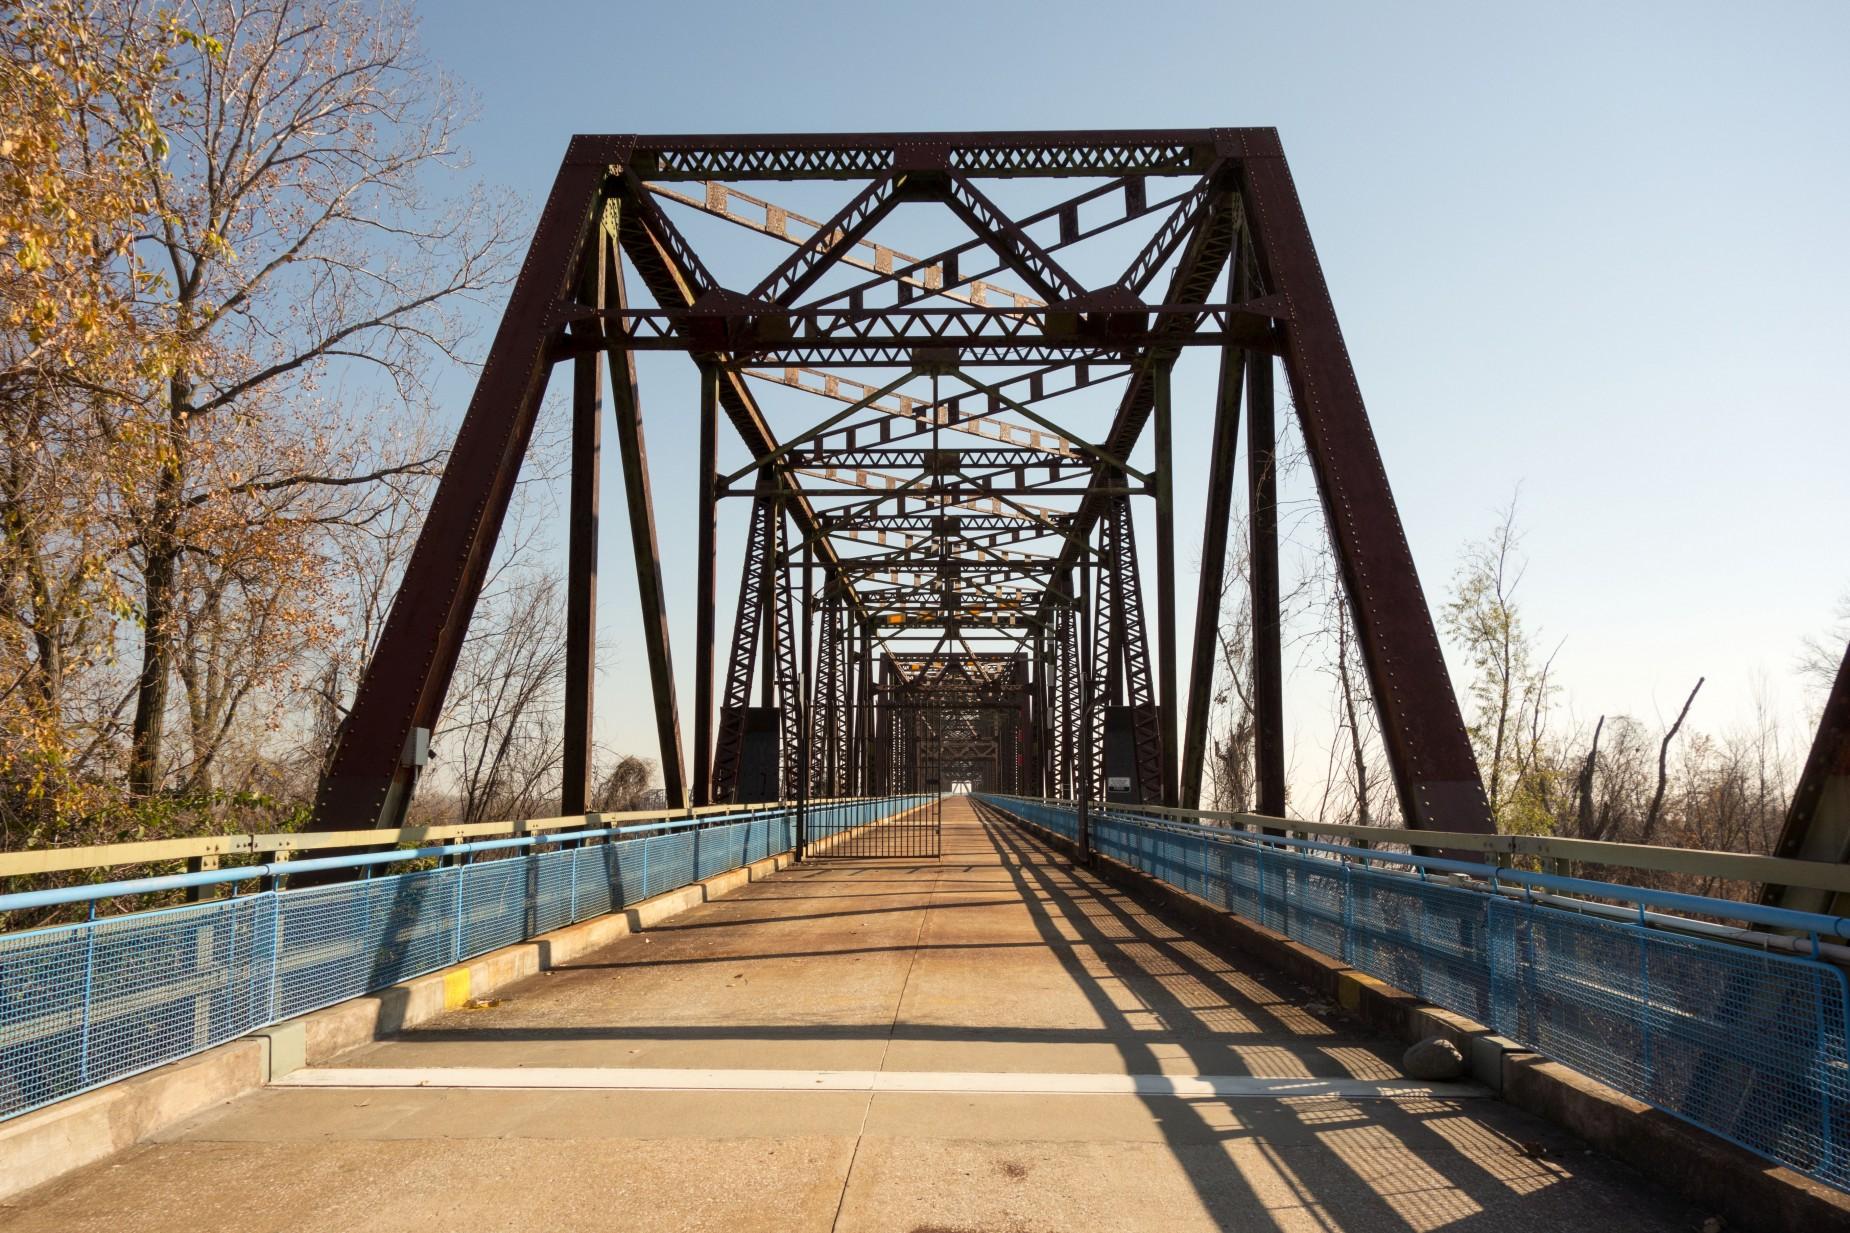 St-Louis-Bicycling-Riverview-Trail-30-1850x1233.jpg